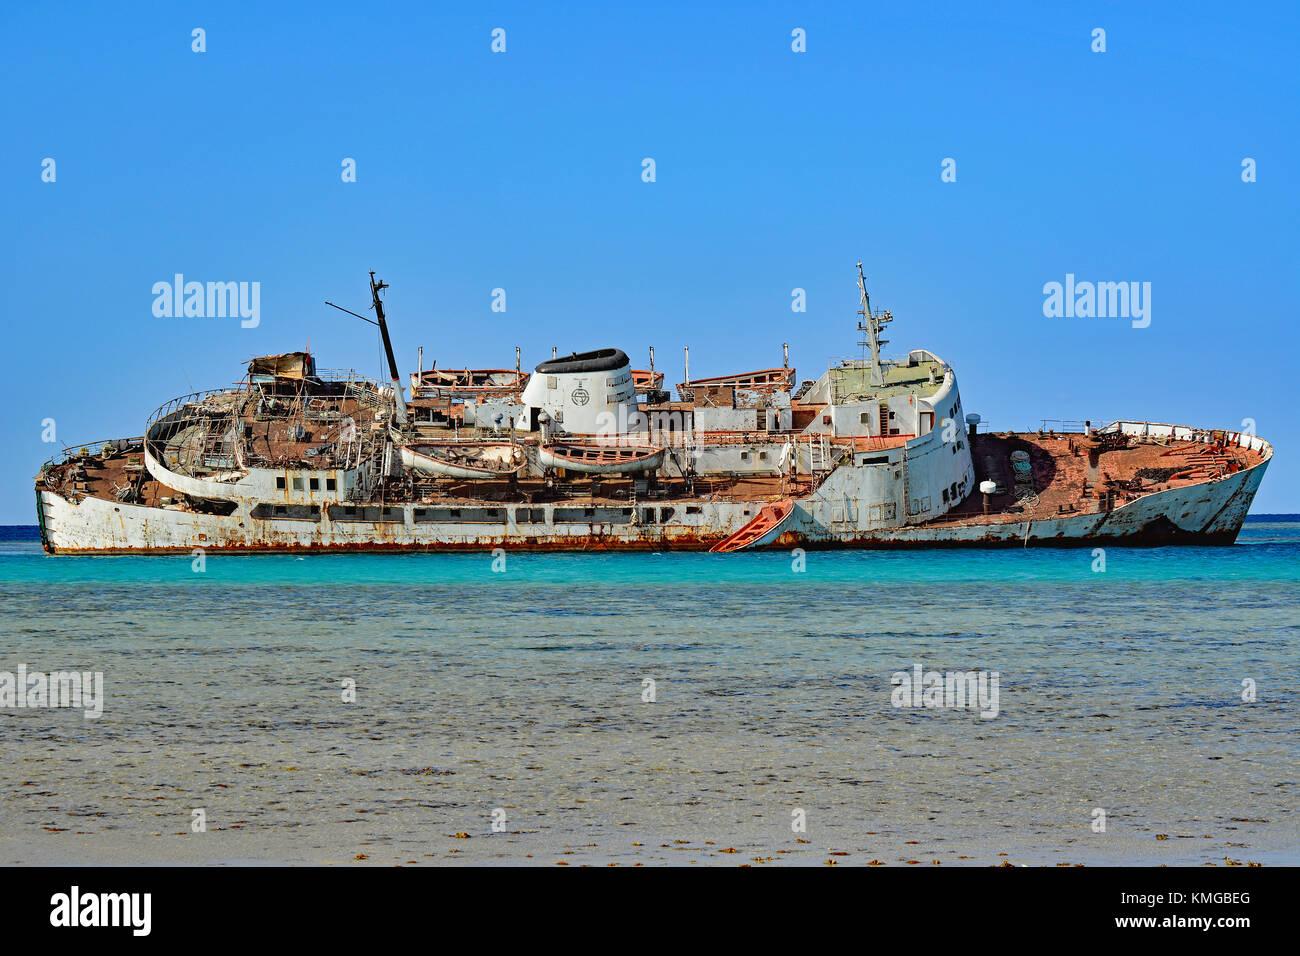 Shipwreck rusting in shallow water near Al Qattan beach, south of Jeddah city, Saudi Arabia. - Stock Image